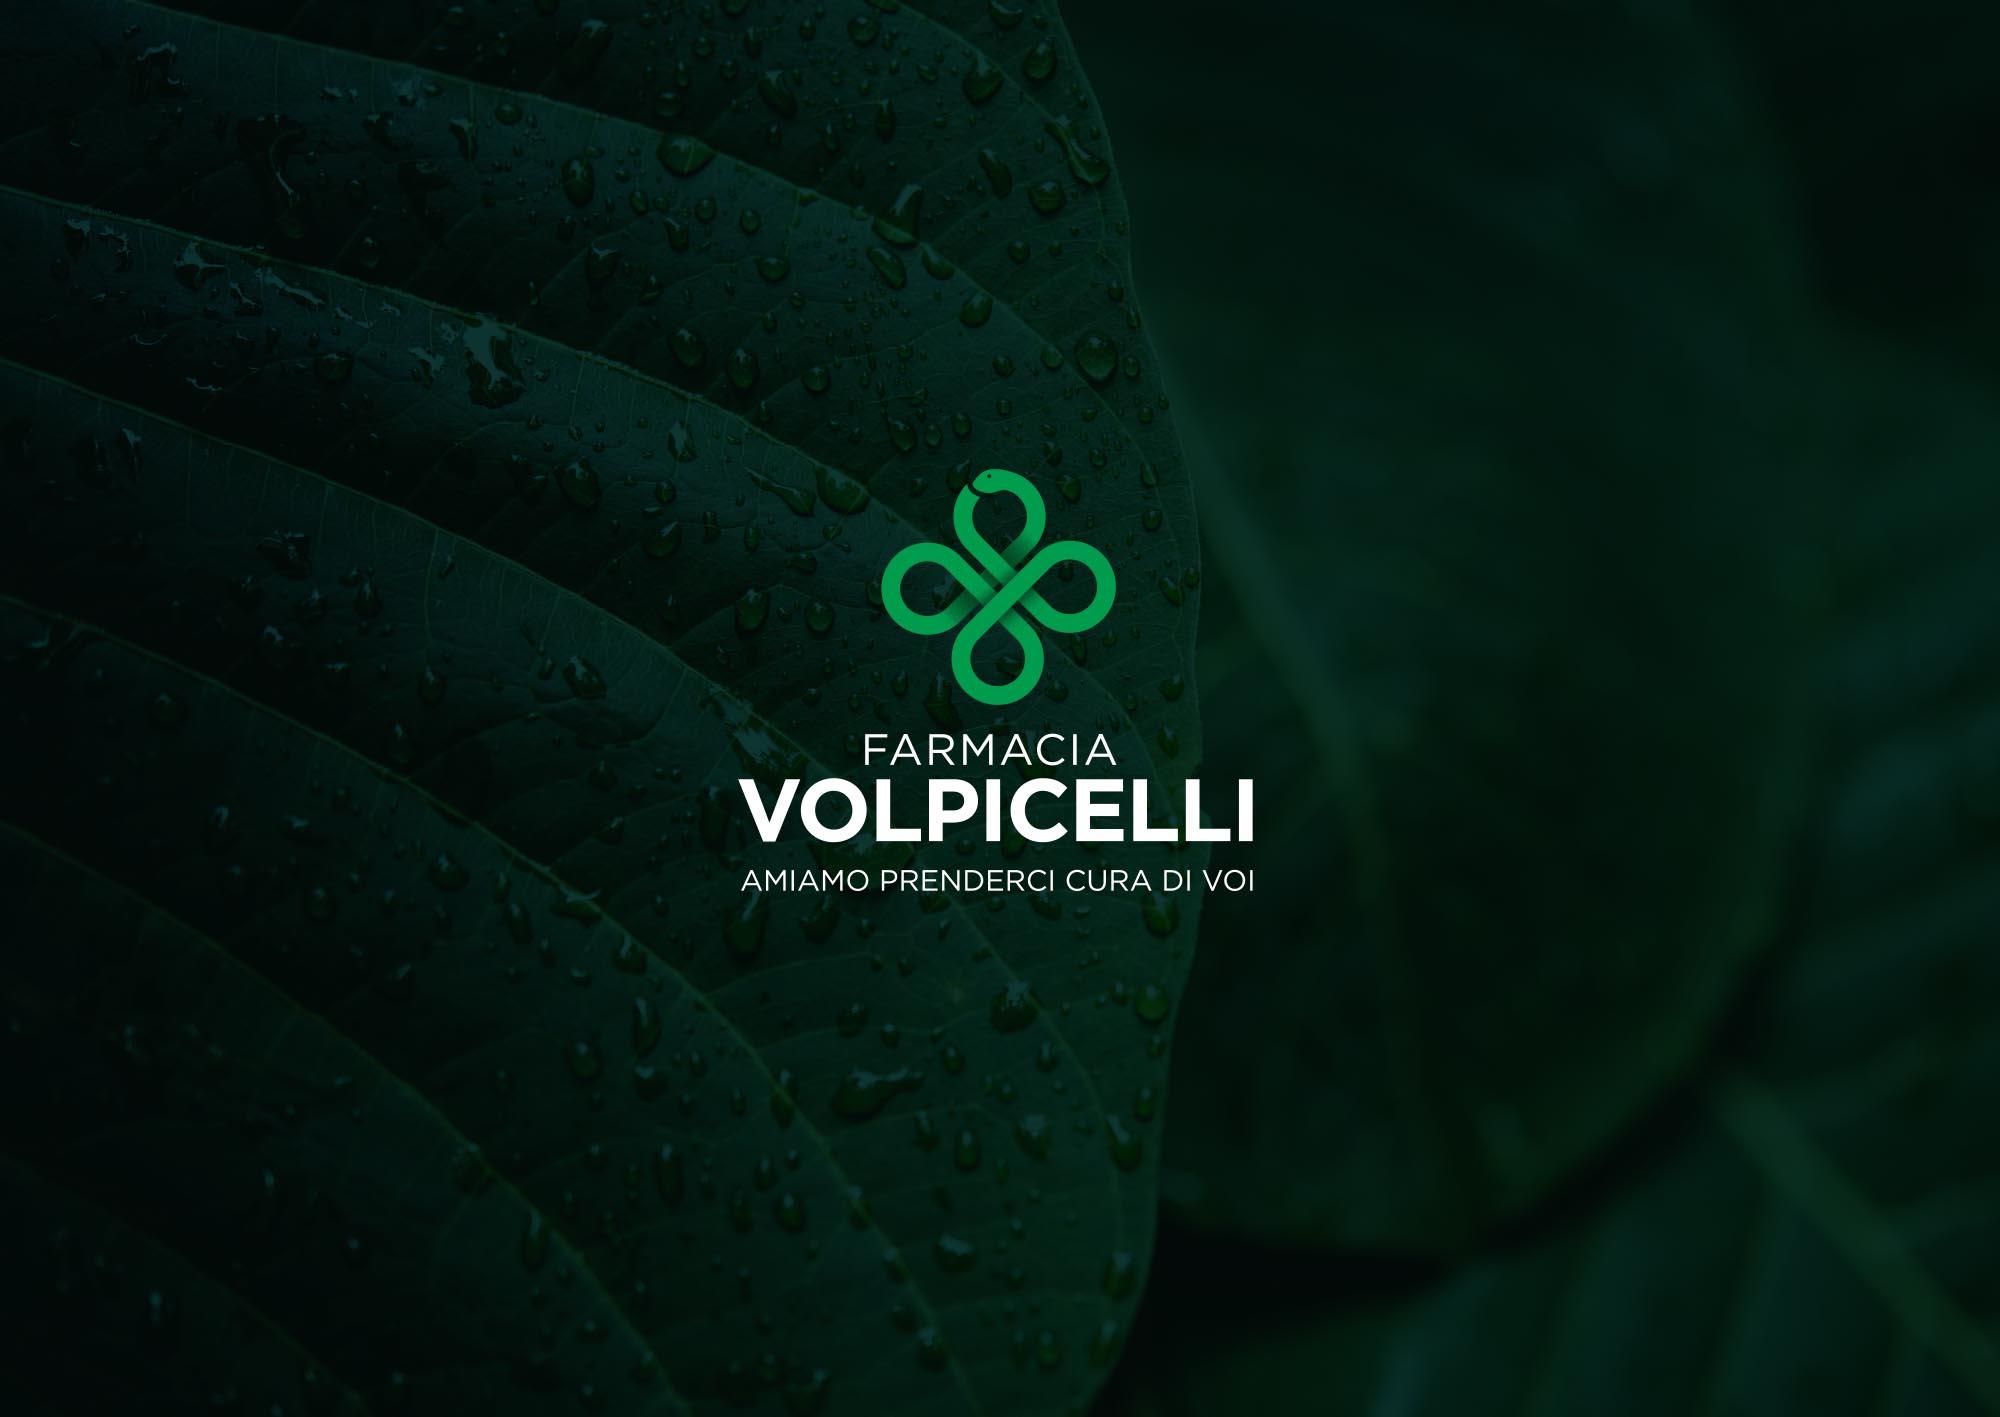 FARMACIAVOLPICELLI_logo_1